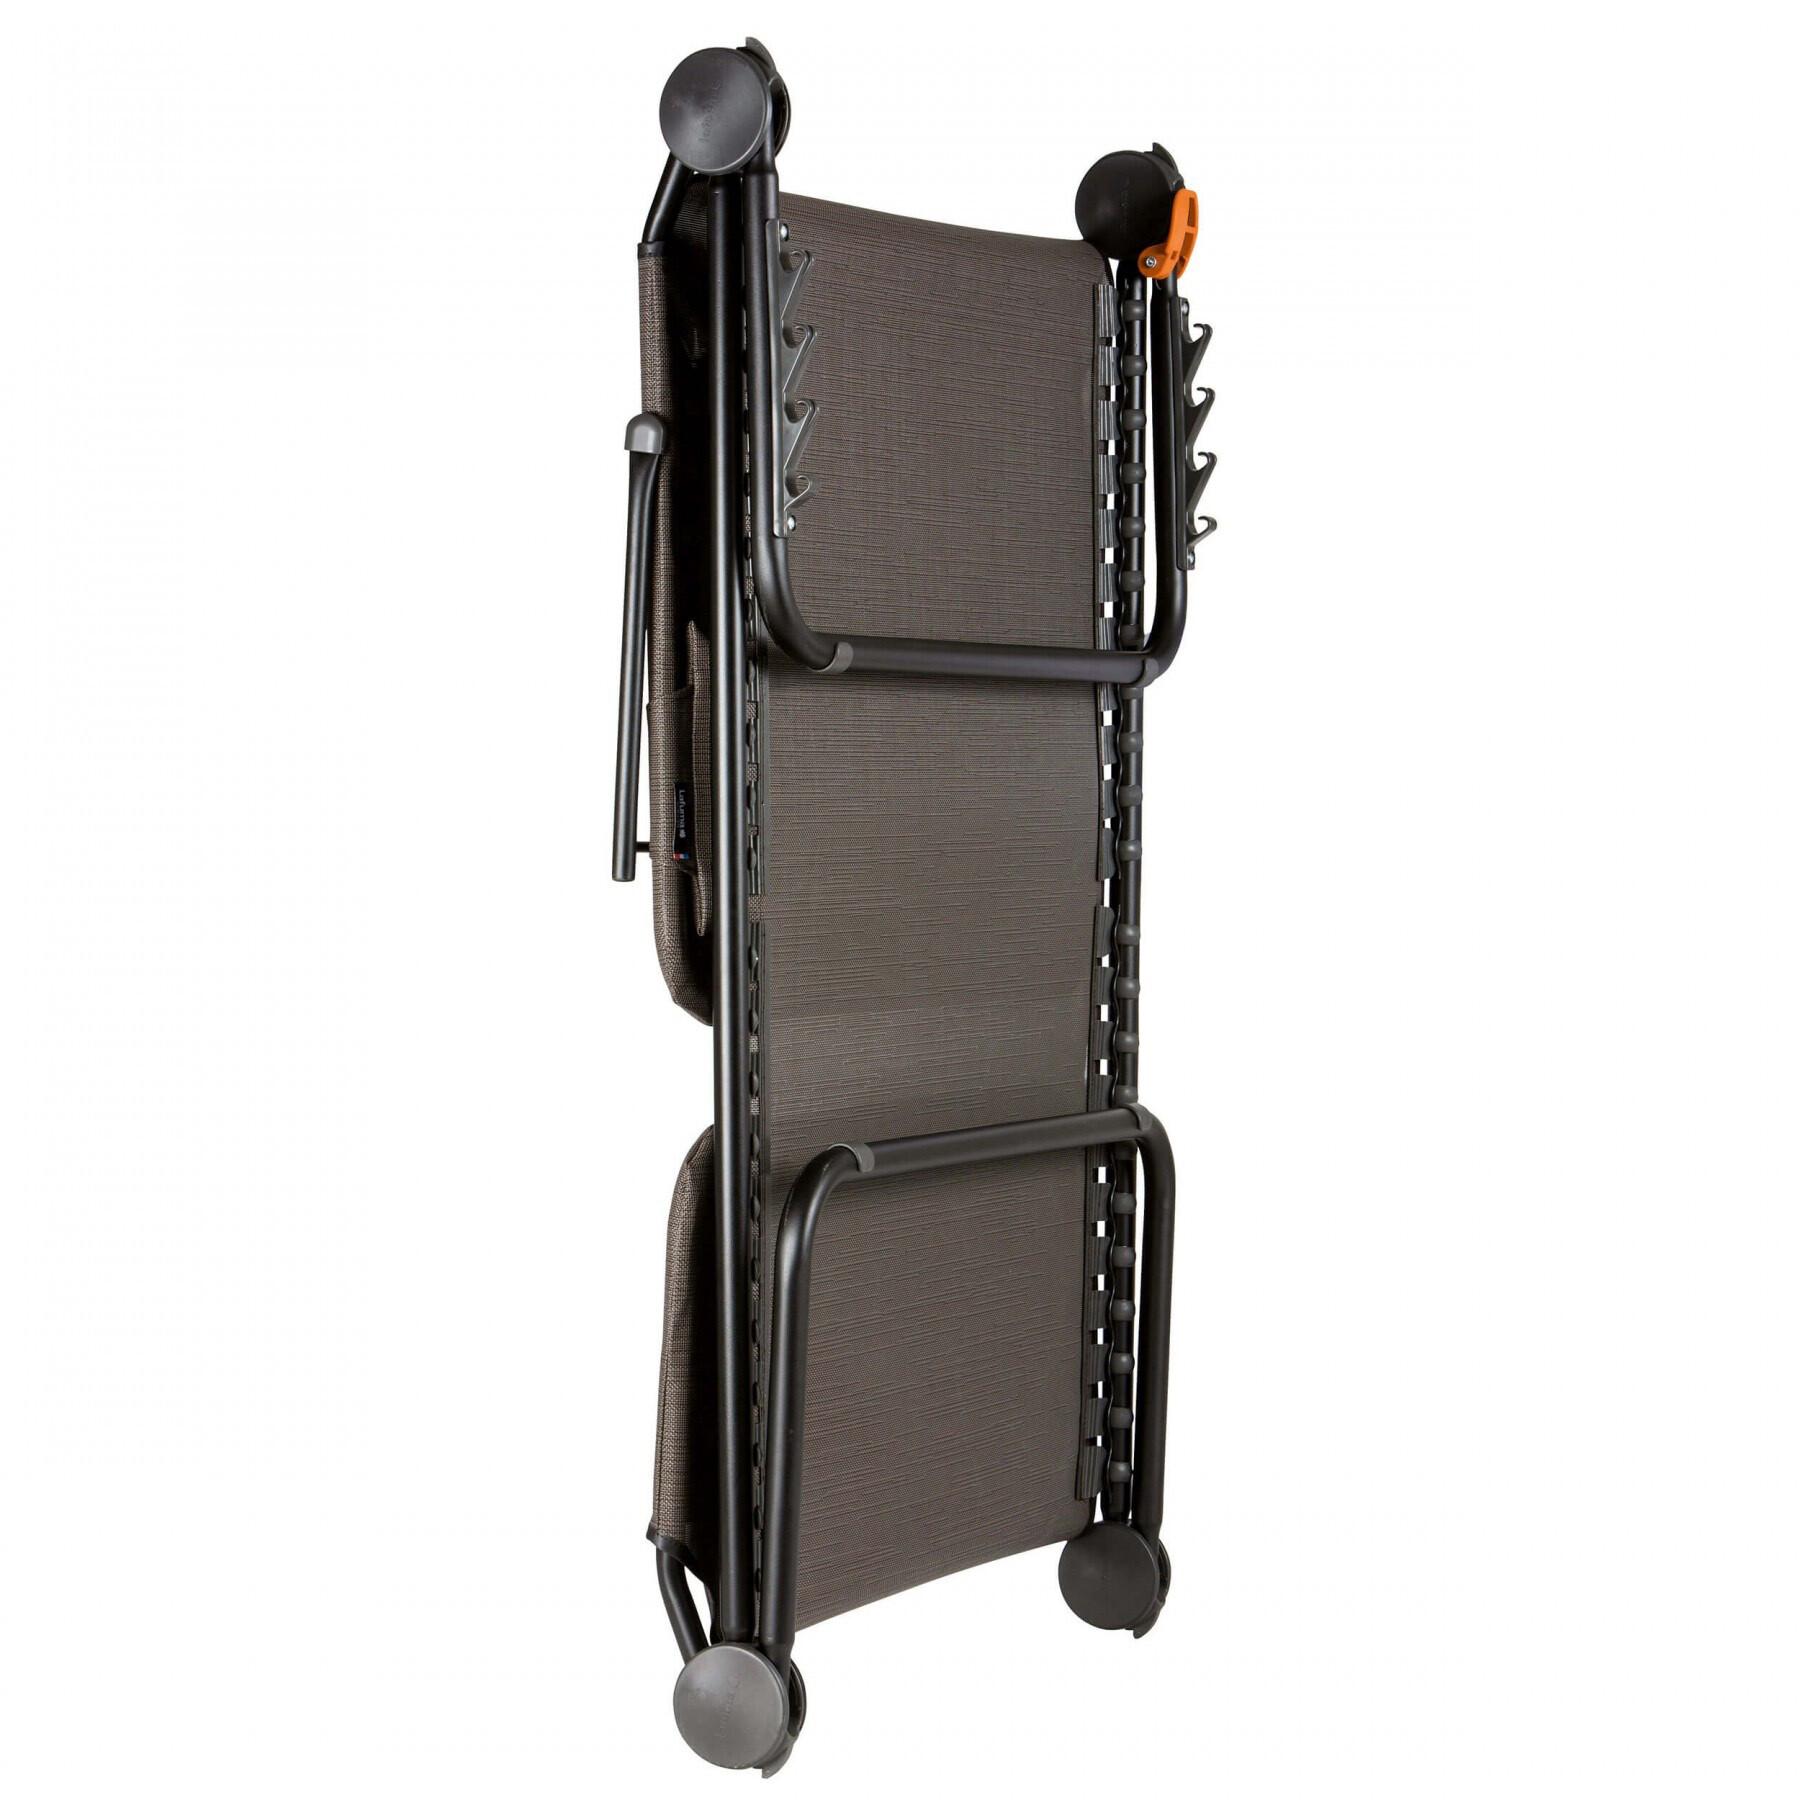 lafuma mobilier sunside chaise longue batyline duo. Black Bedroom Furniture Sets. Home Design Ideas